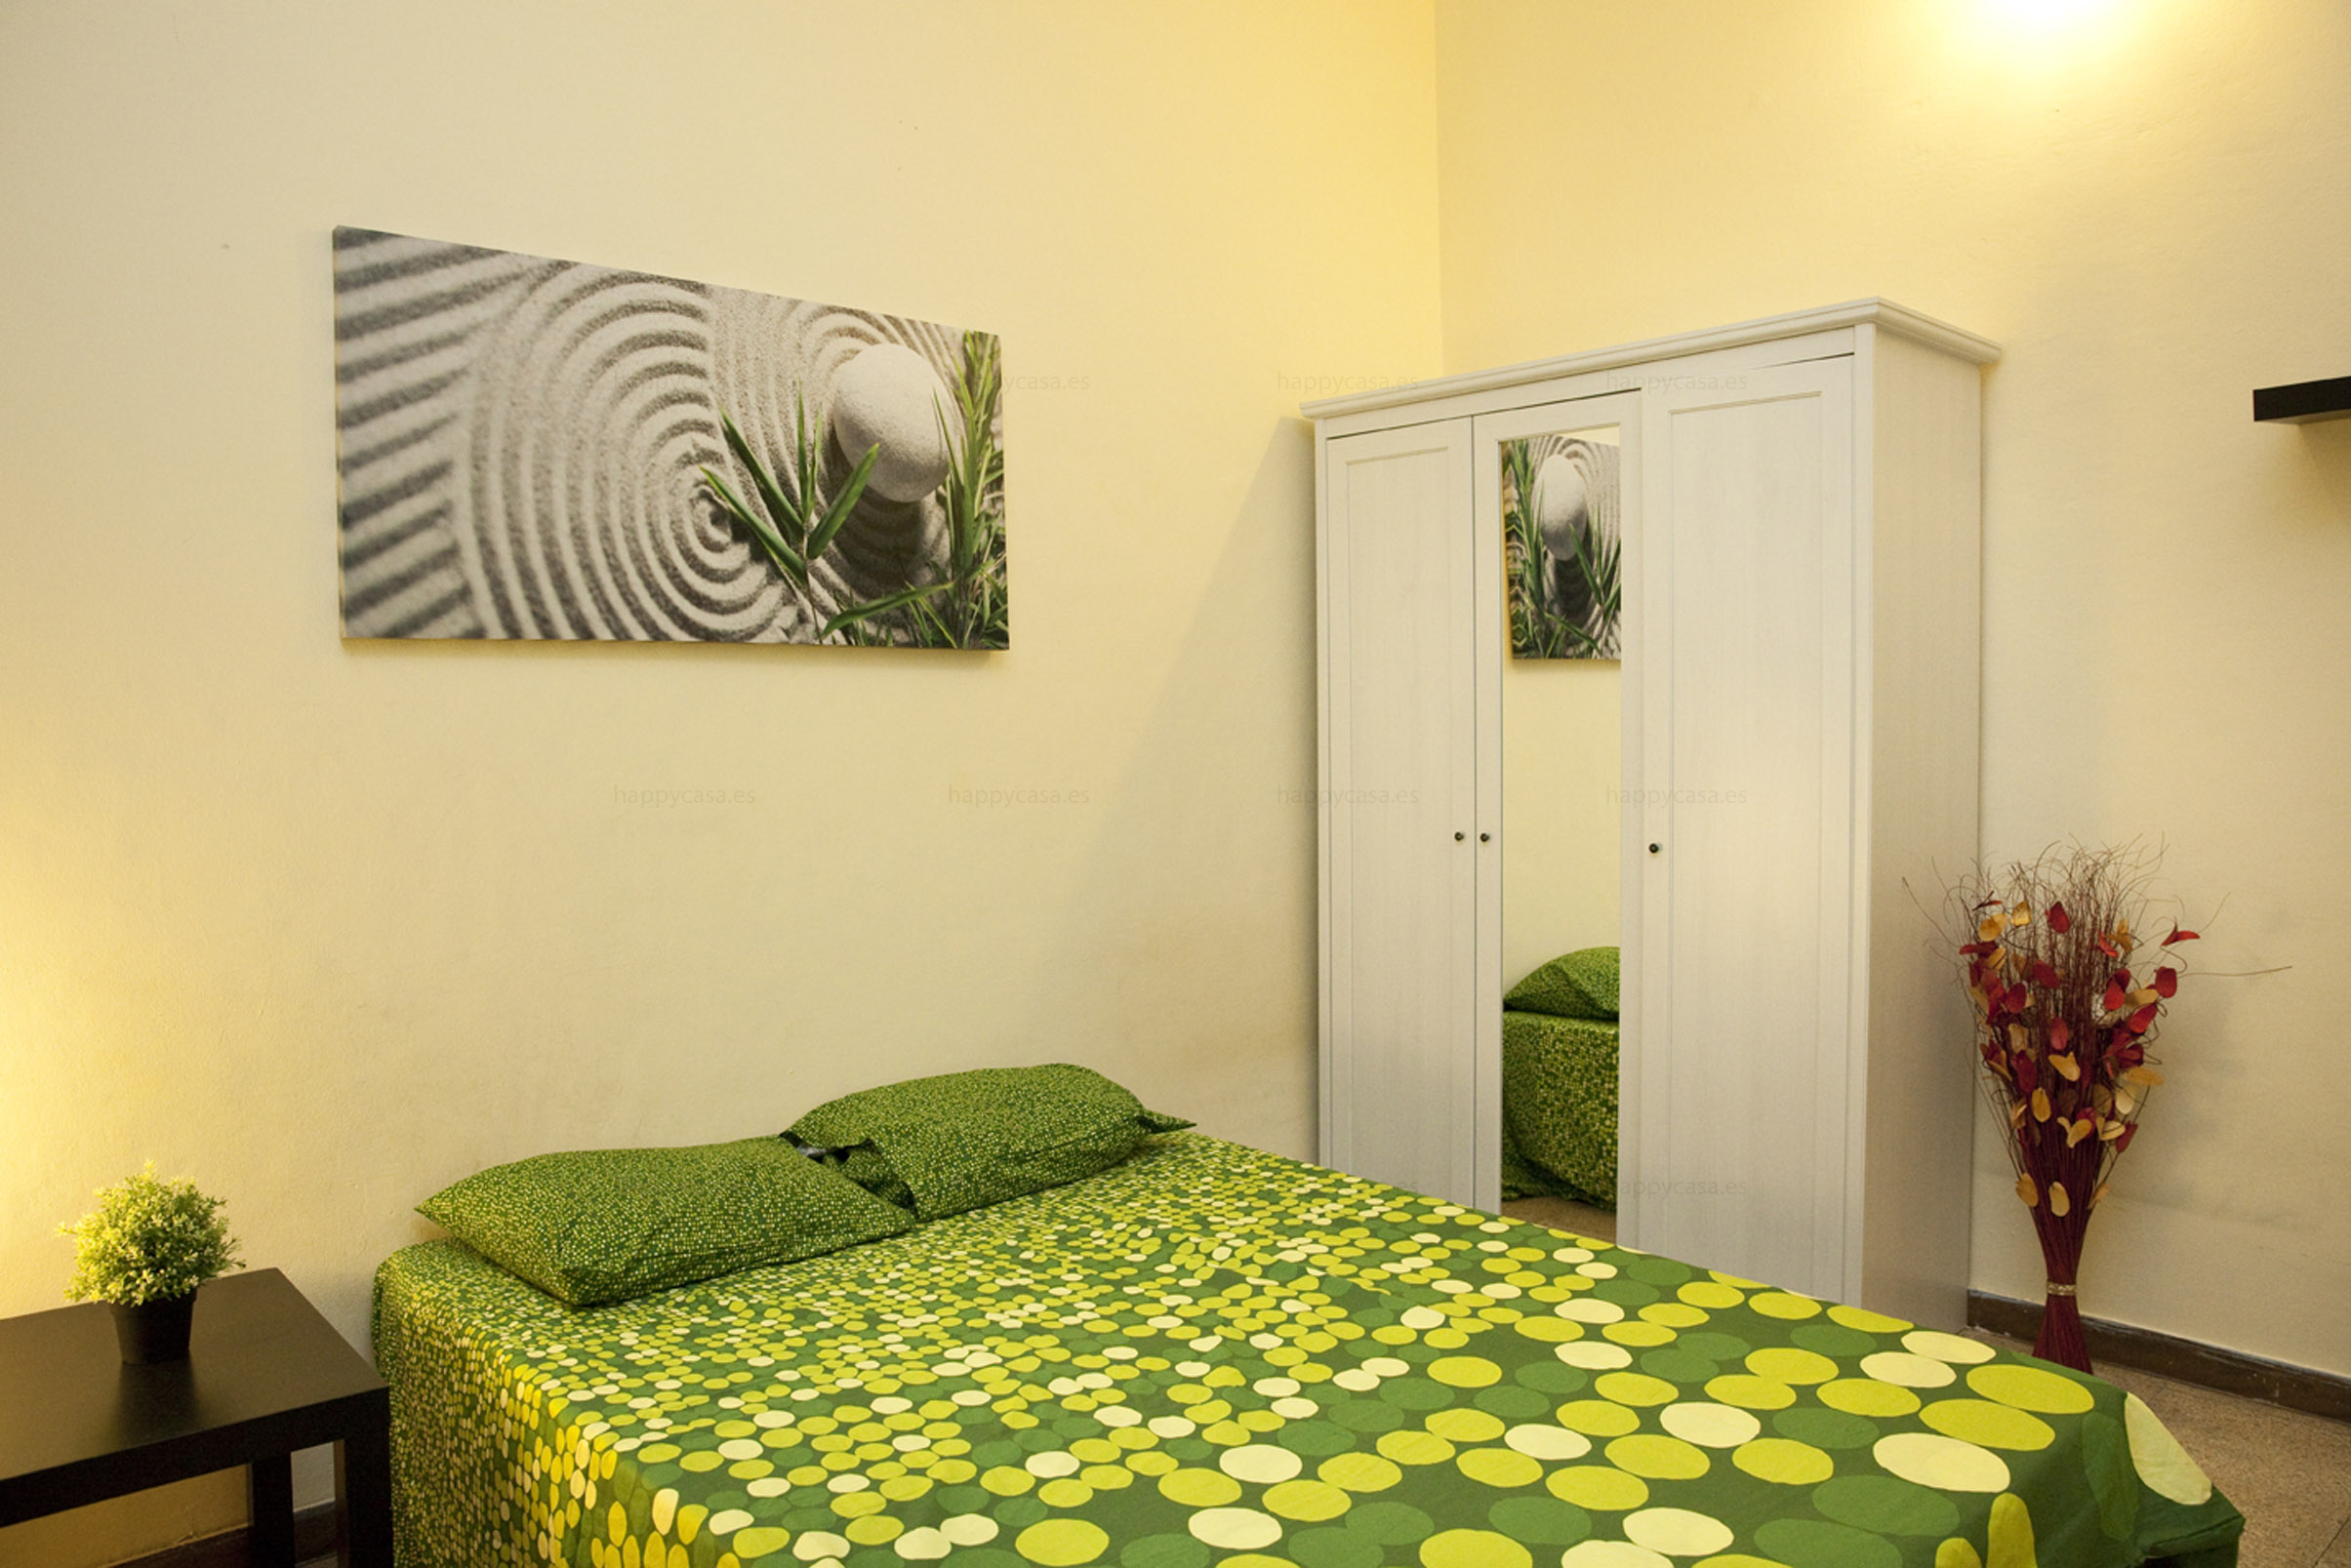 Alquilar habitaci n en barcelona cerca plaza for Alquilar habitacion en murcia